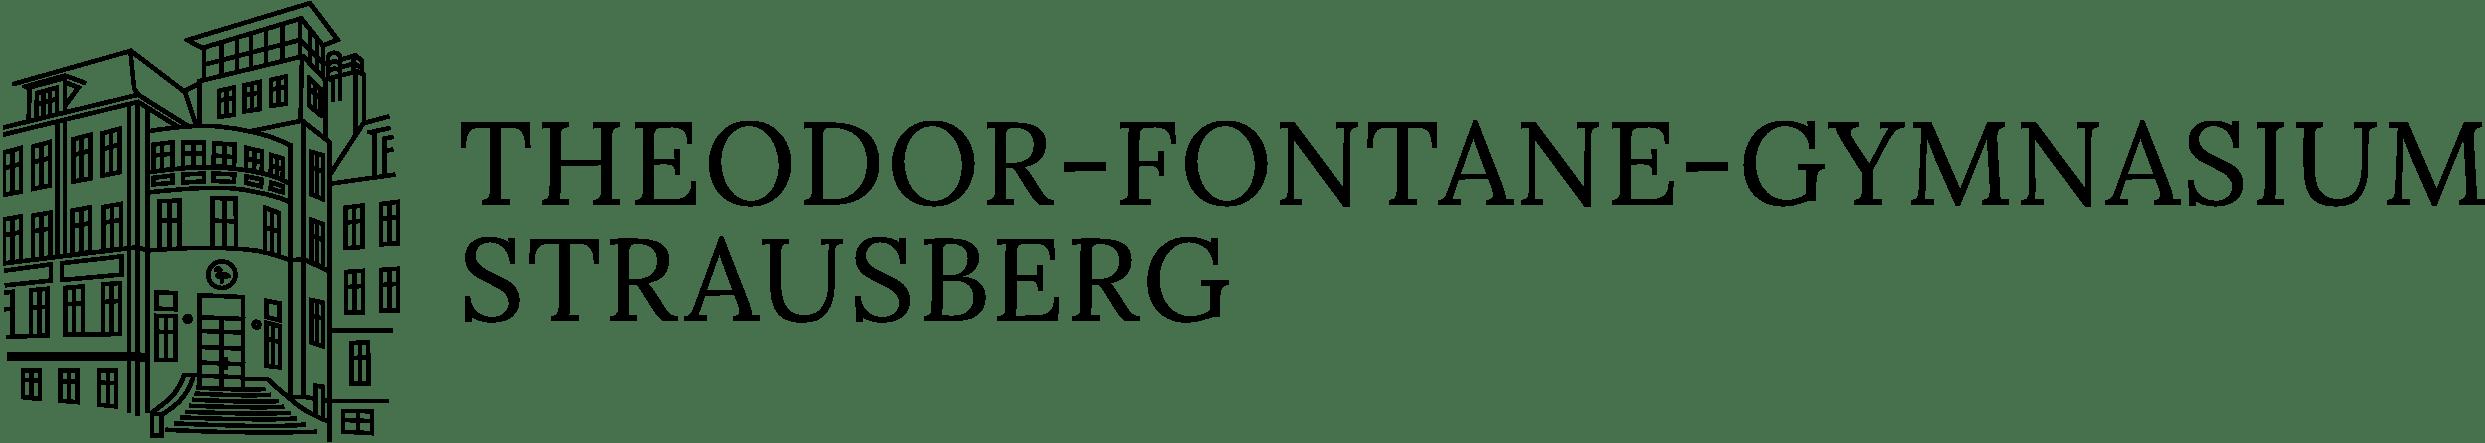 Theodor-Fontane-Gymnasium Strausberg